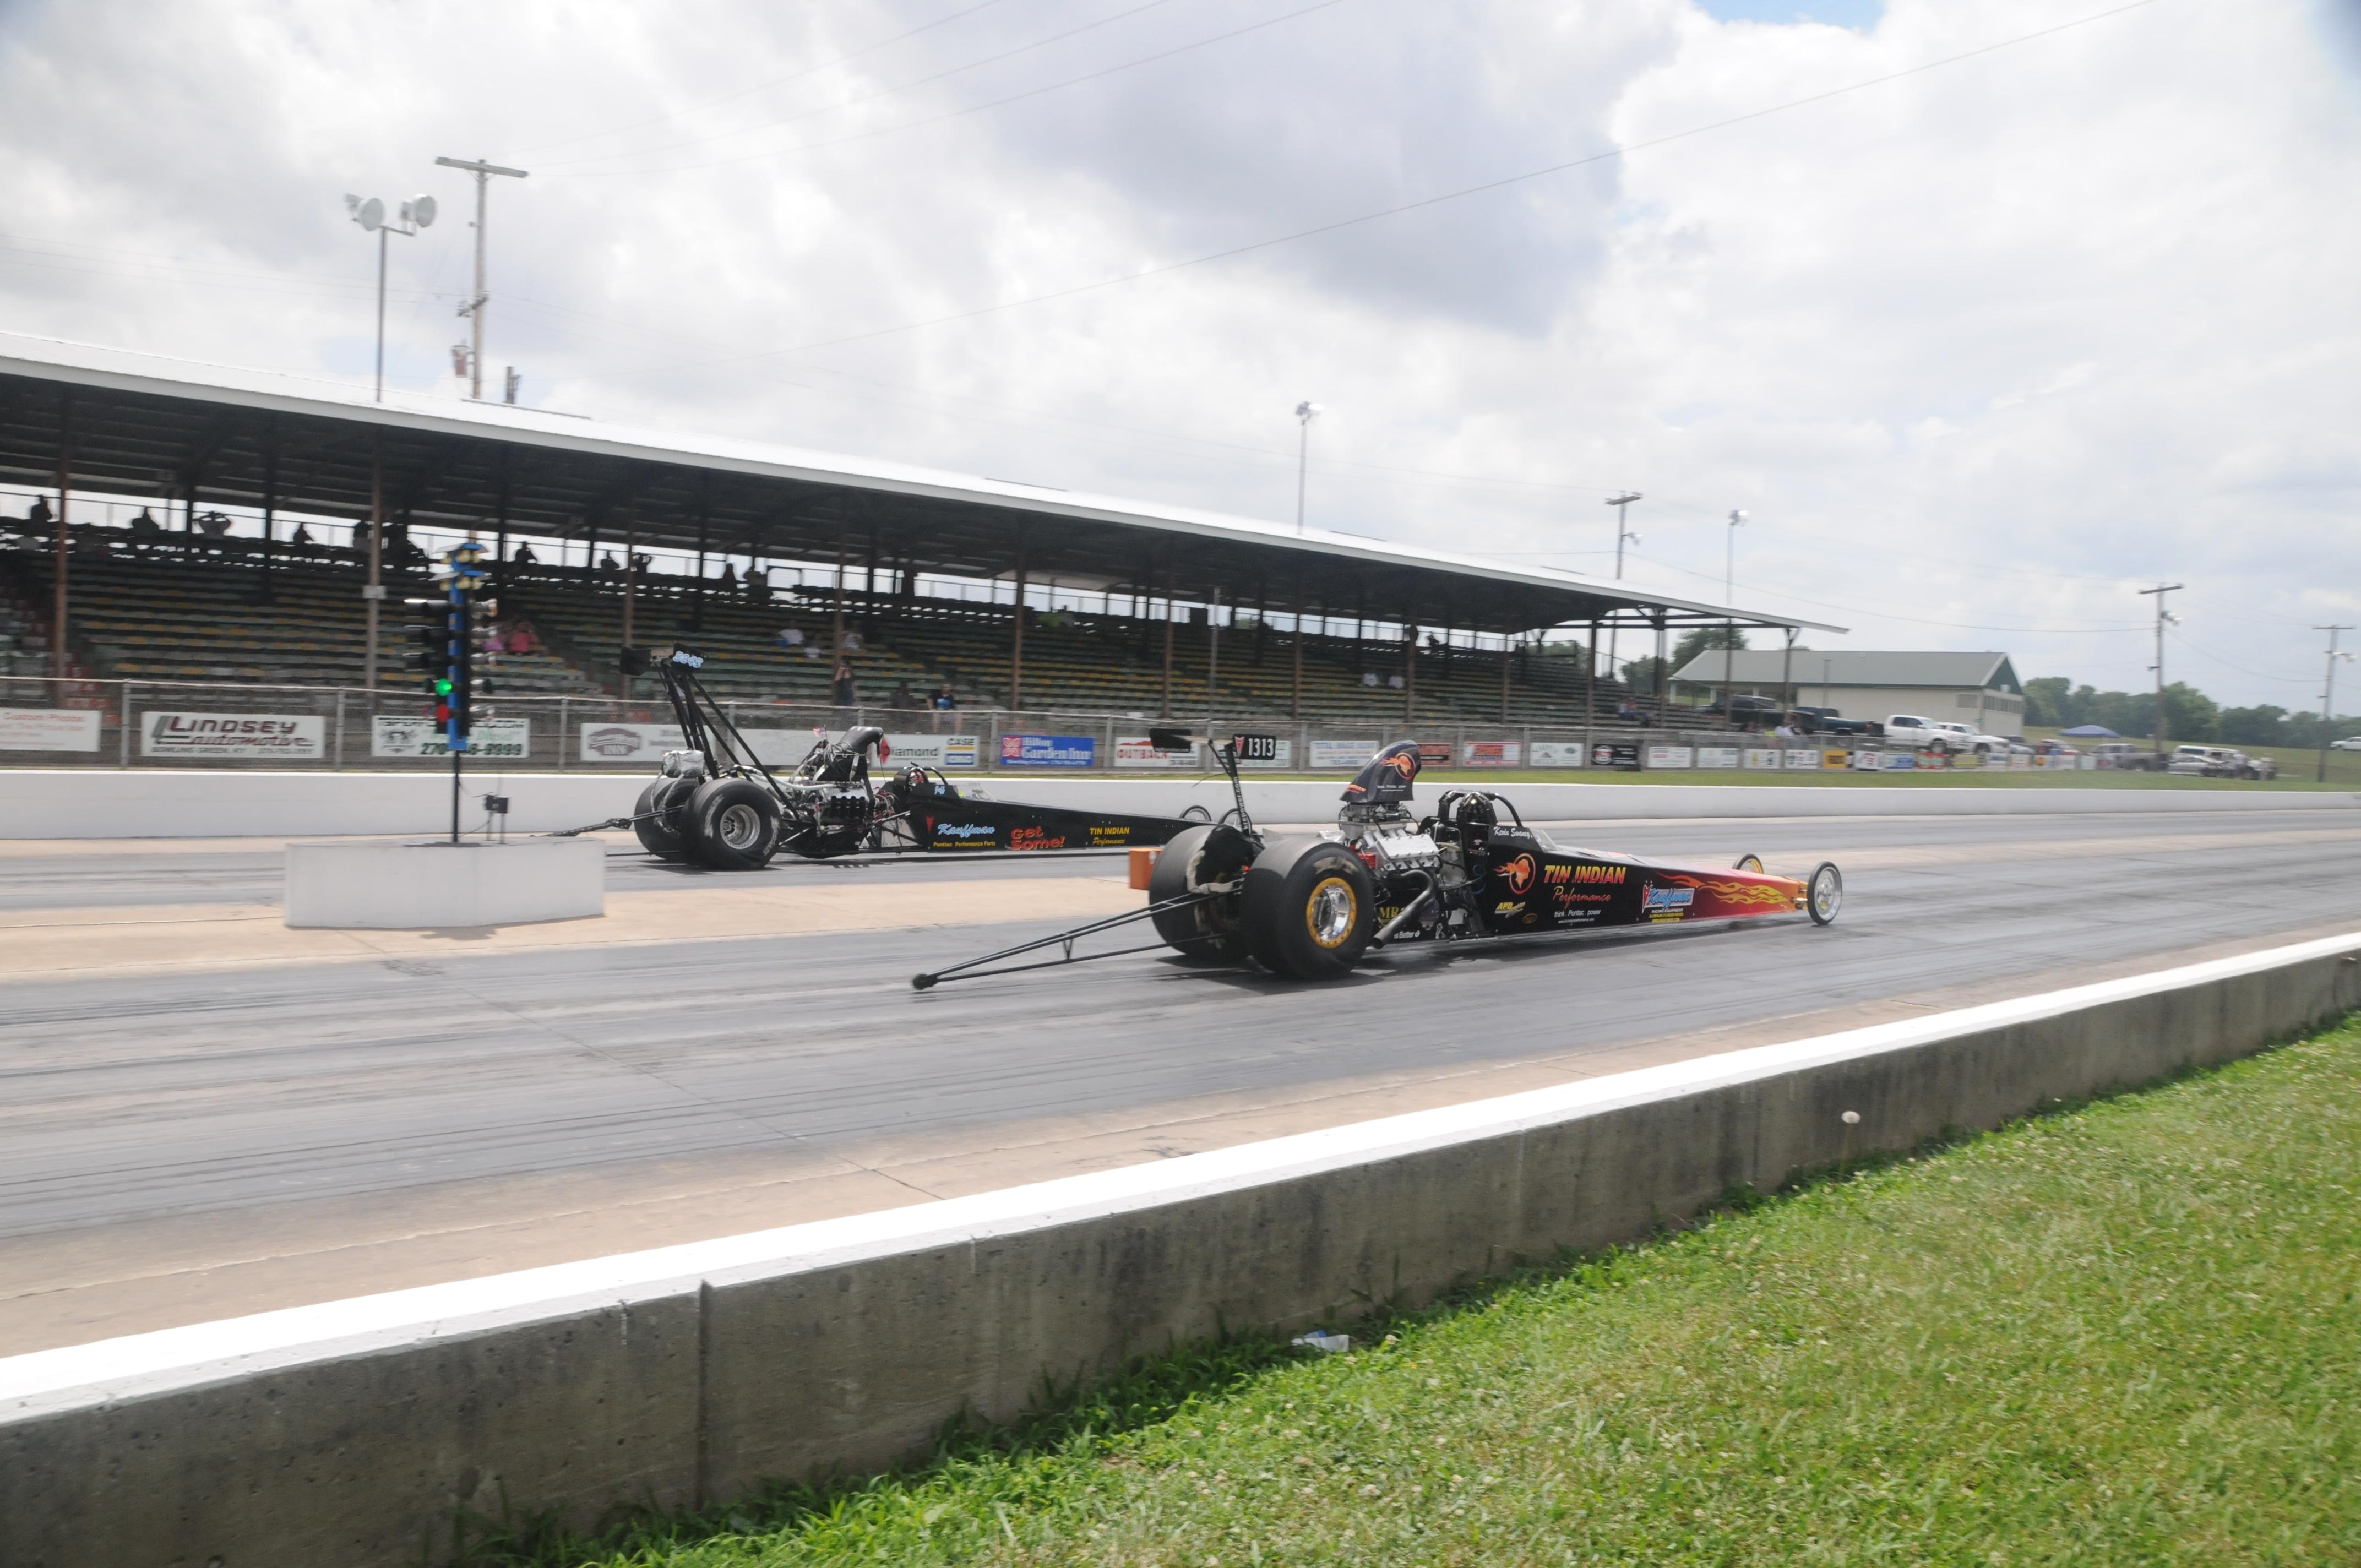 Kauffman v Swaney 2015 PUSN down track – The Pontiac U S